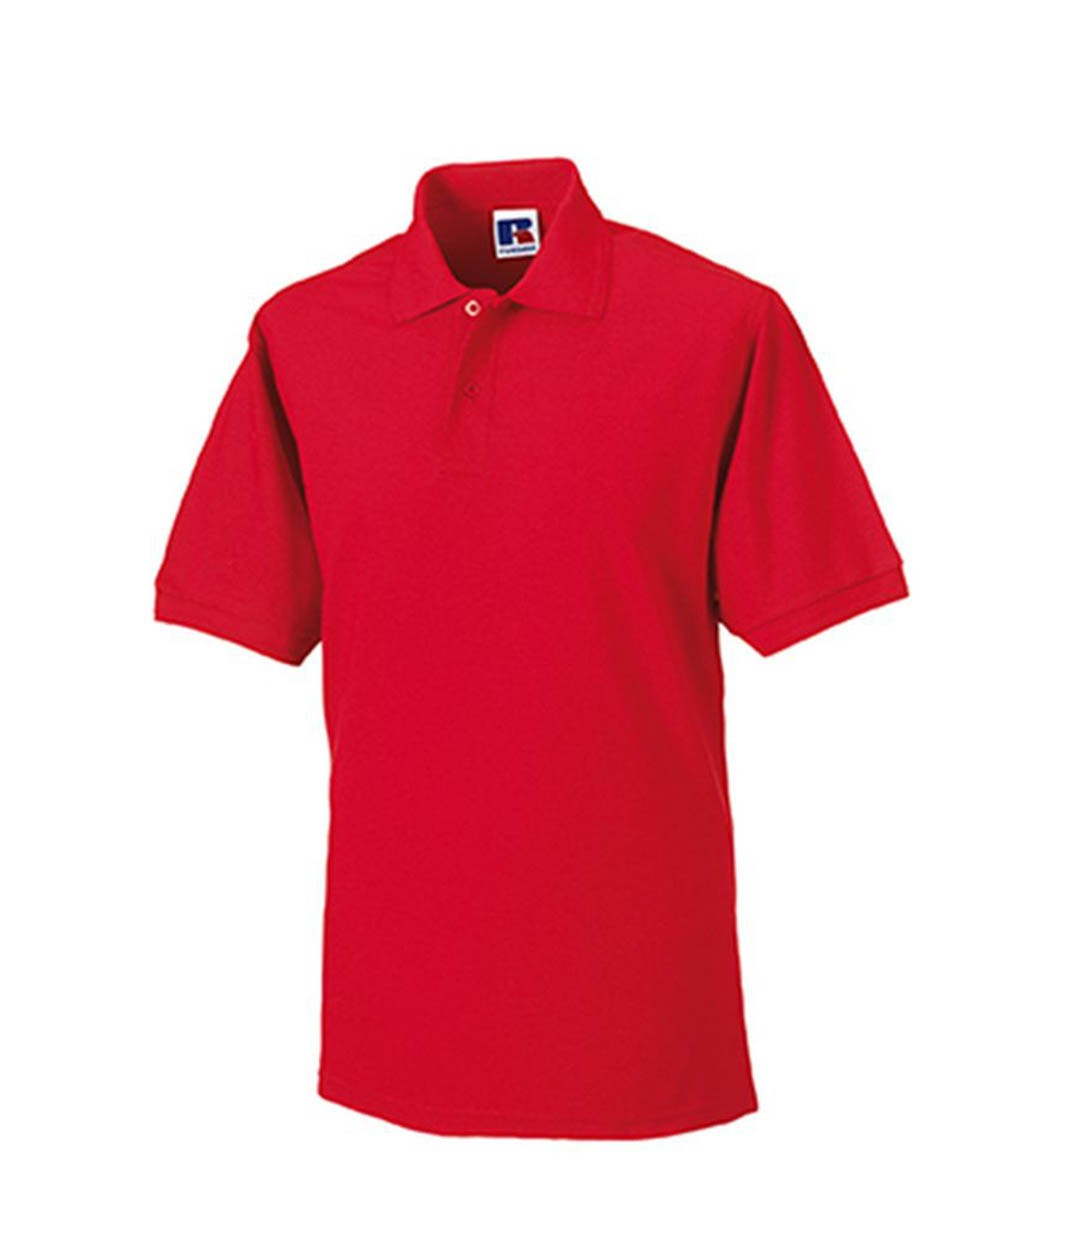 c4c76d33 Russell Workwear 599M Hardwearing Pique Polo Shirt - Plain Poly ...